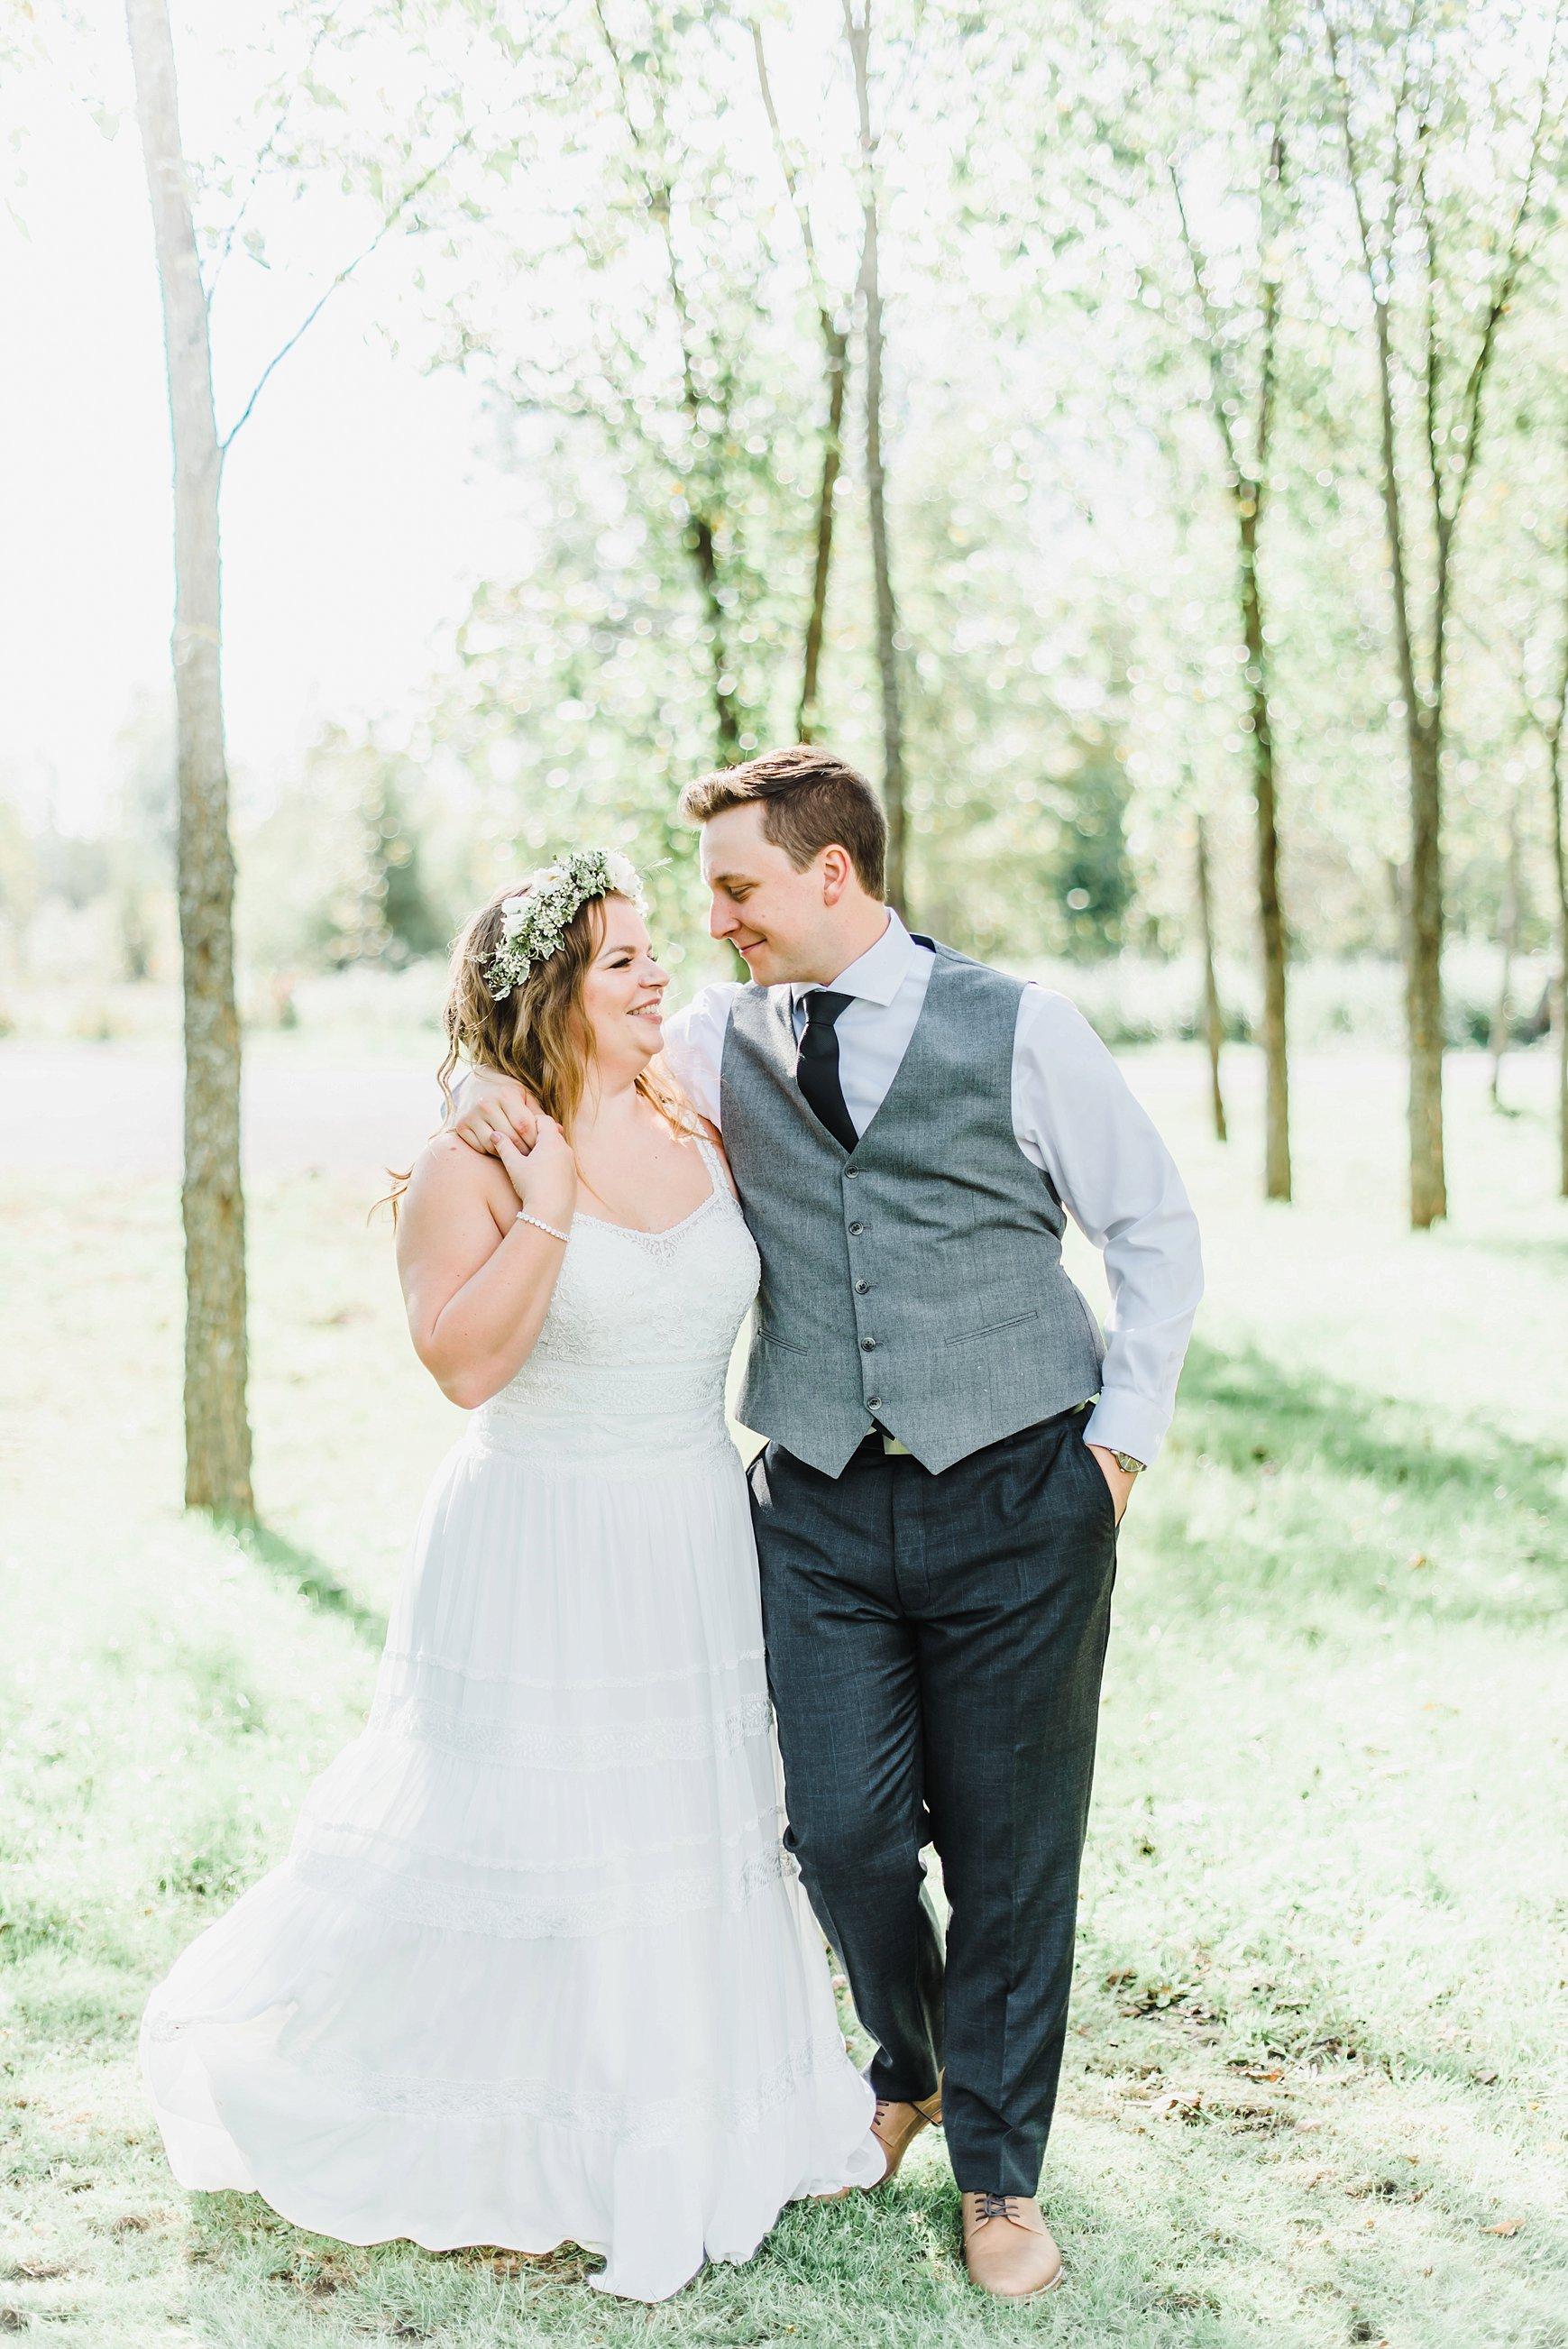 light airy indie fine art ottawa wedding photographer | Ali and Batoul Photography_1114.jpg